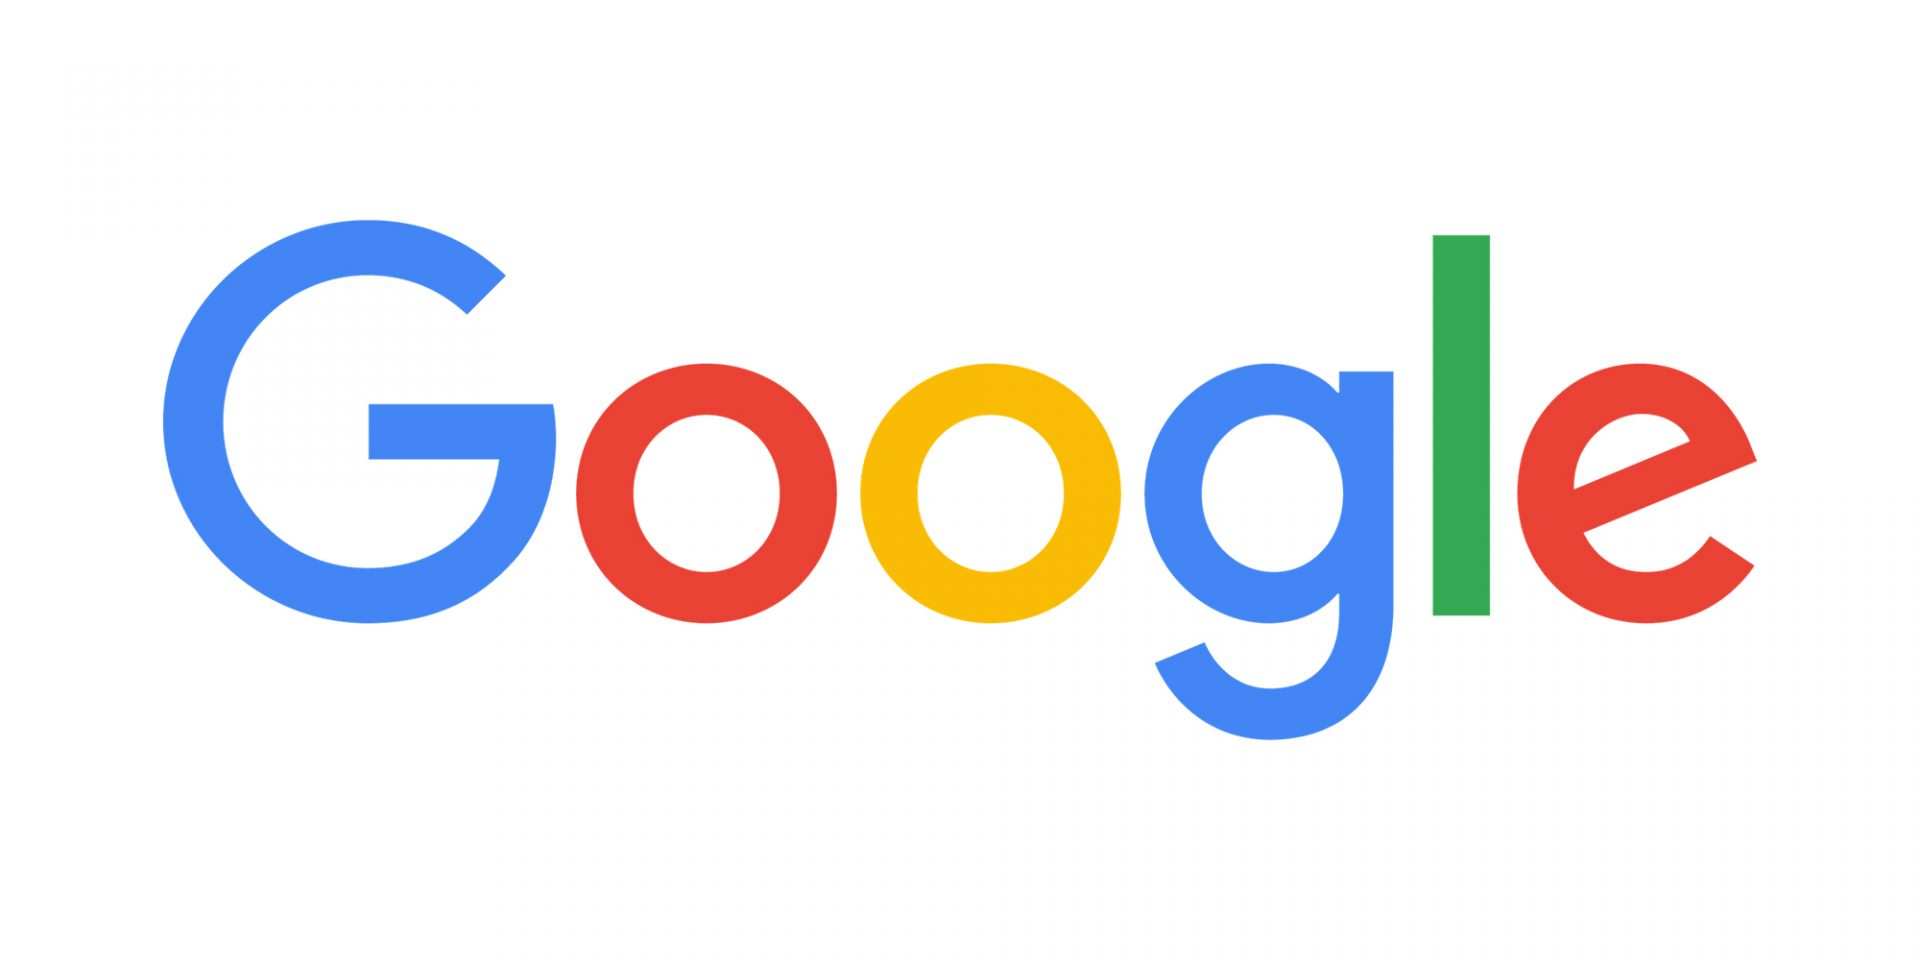 logo_Google_FullColor_3x_830x271px.max-2800x2800